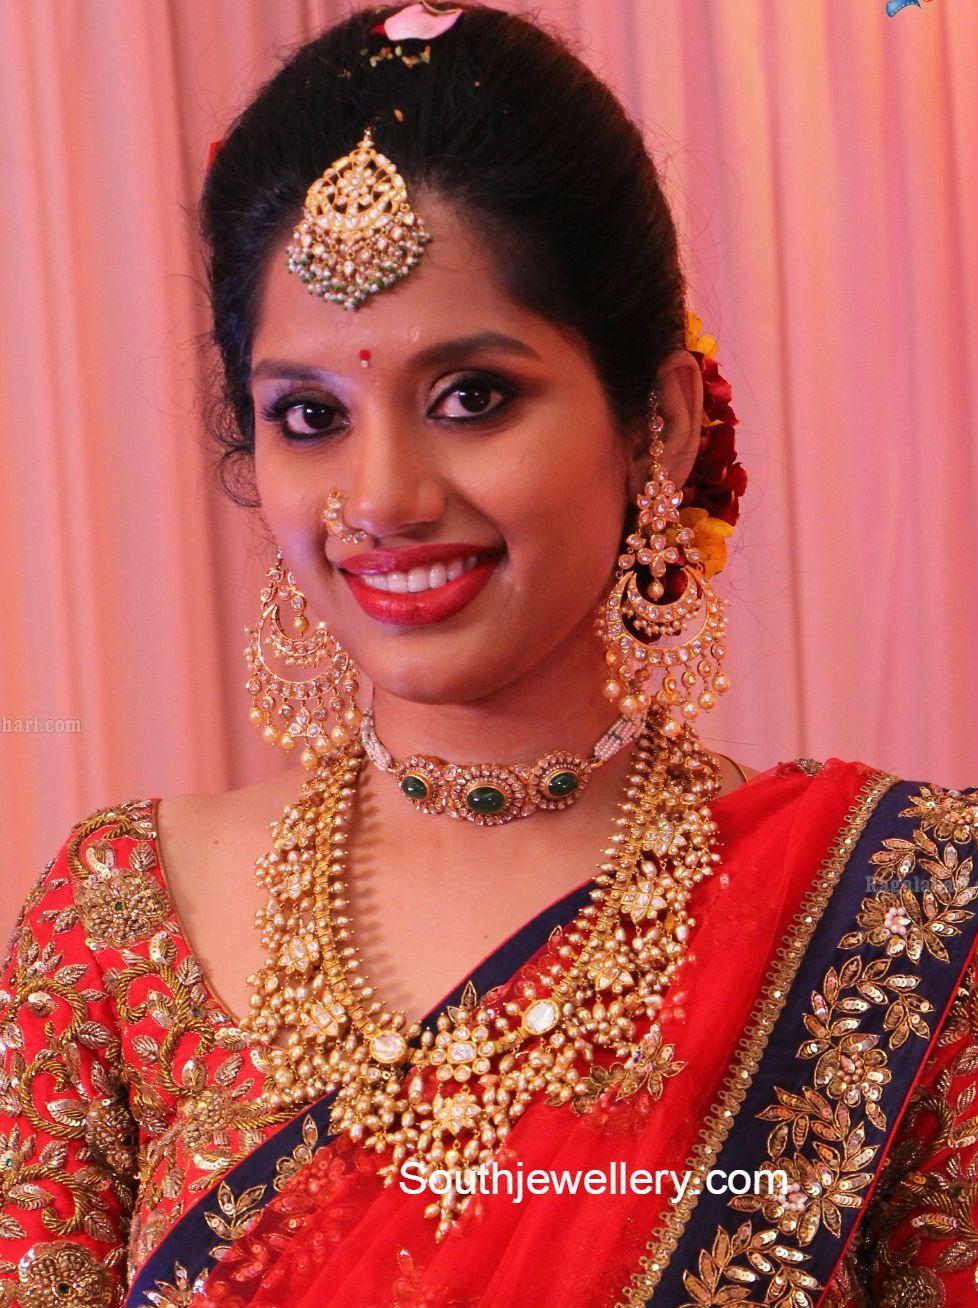 Guttapusalu Haram And Polki Chandbalis Latest Jewelry Designs Jewellery Designs Indian Jewellery Design 22 Carat Gold Jewellery Bridal Jewellery Indian,Sri Lanka Bathroom Designs Photos